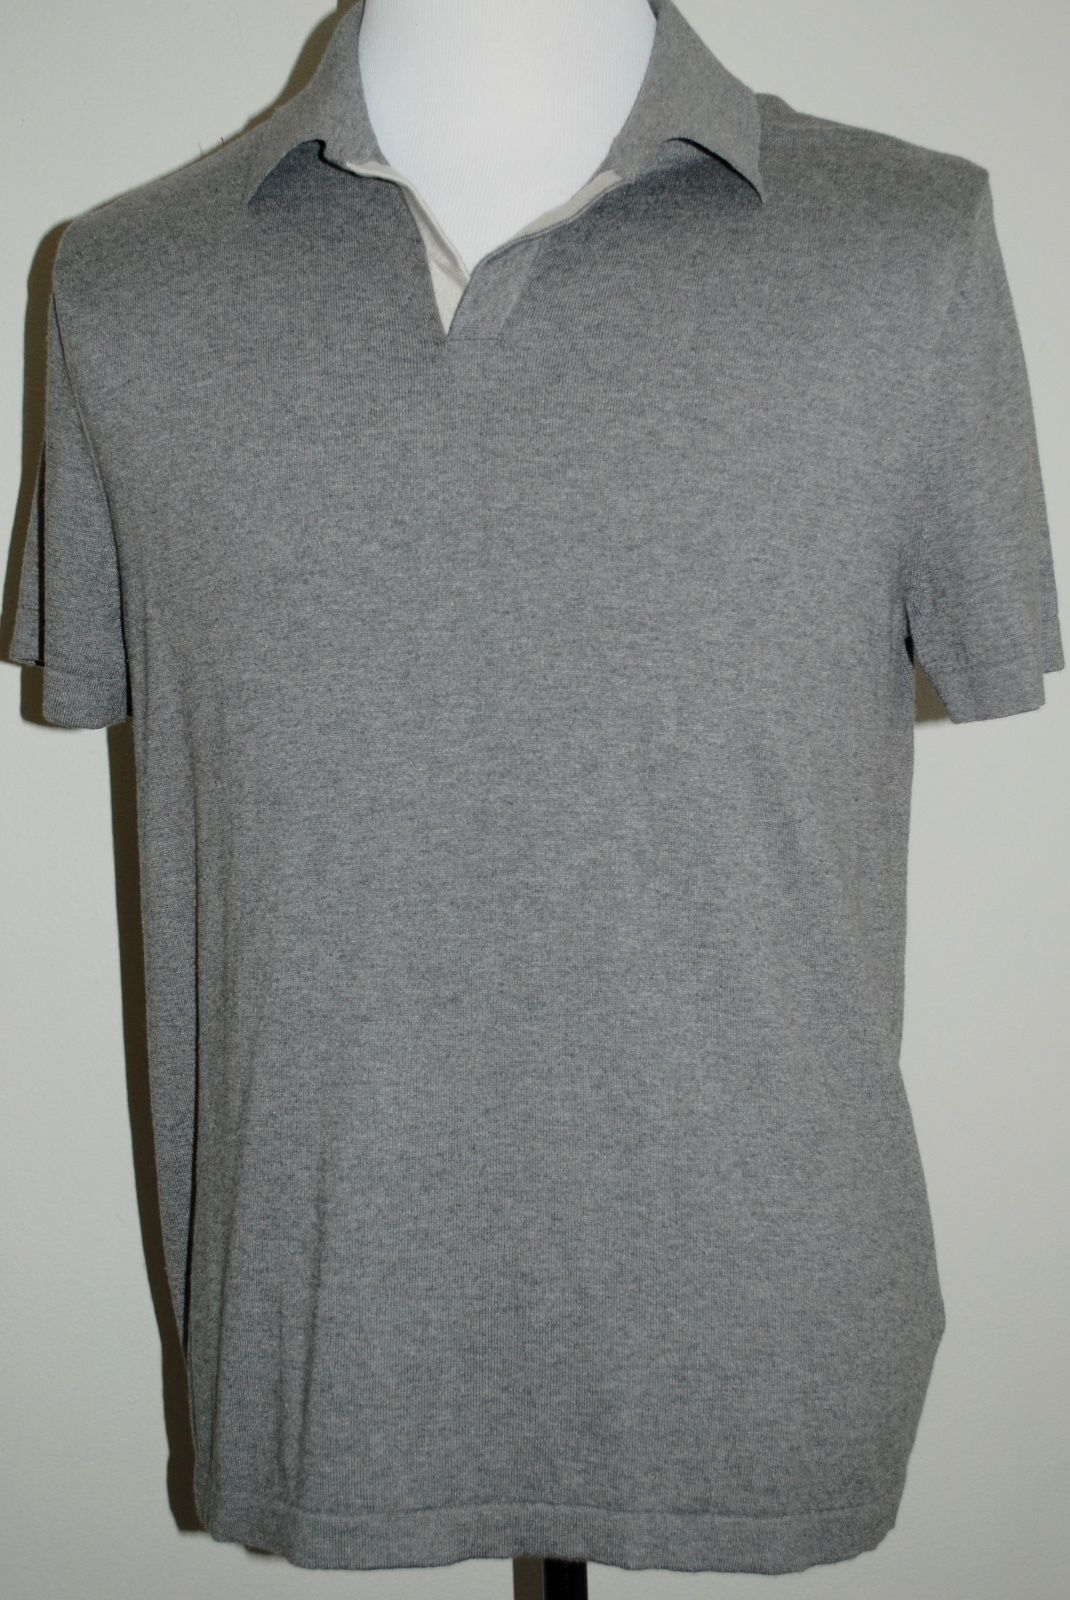 f3e8b54b Banana Republic Polo Shirt Silk, Cotton, and 50 similar items. 57